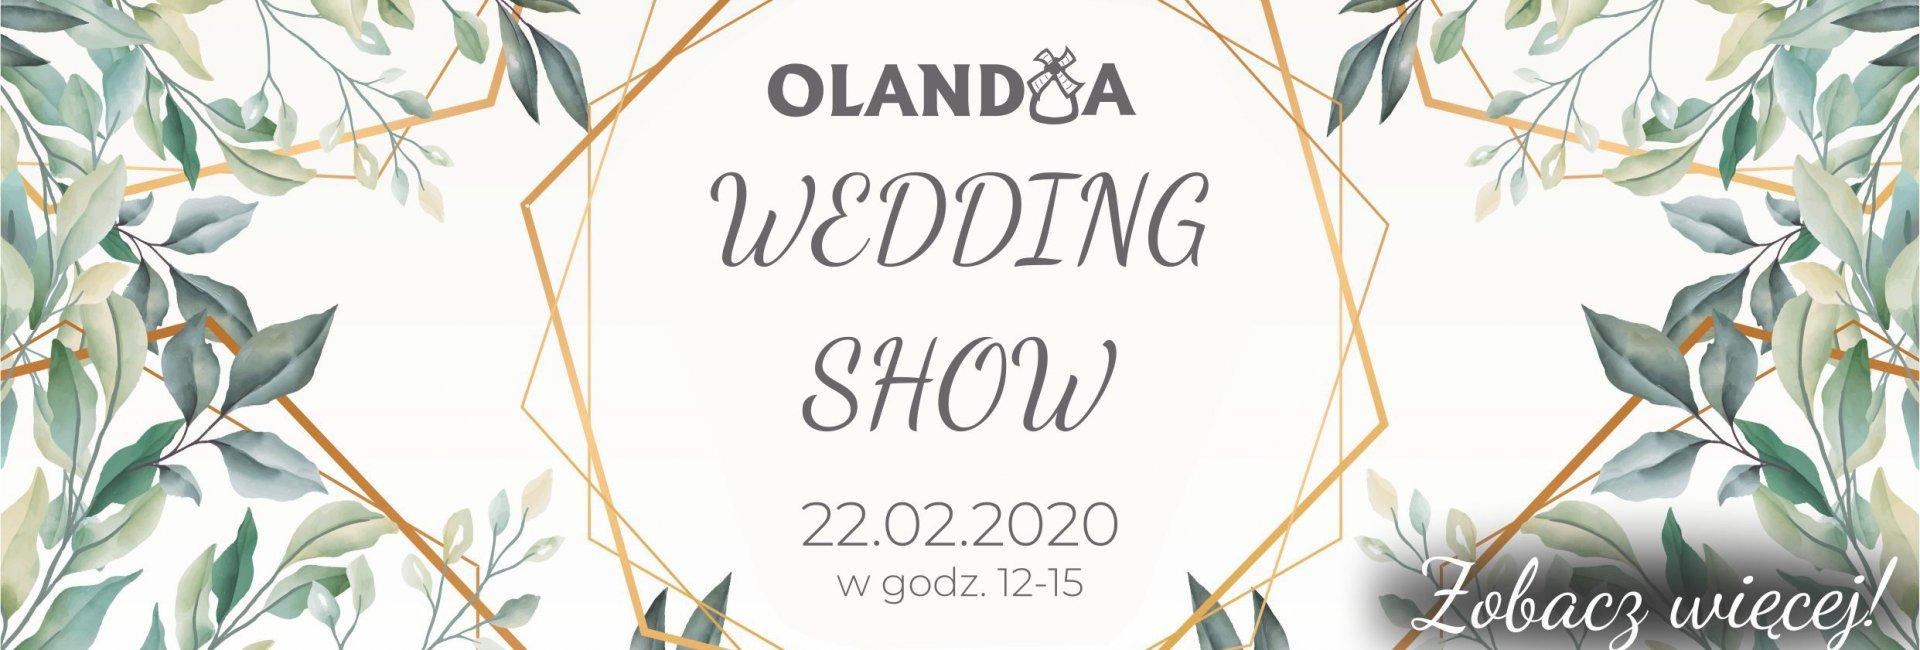 Olandia Wedding Show